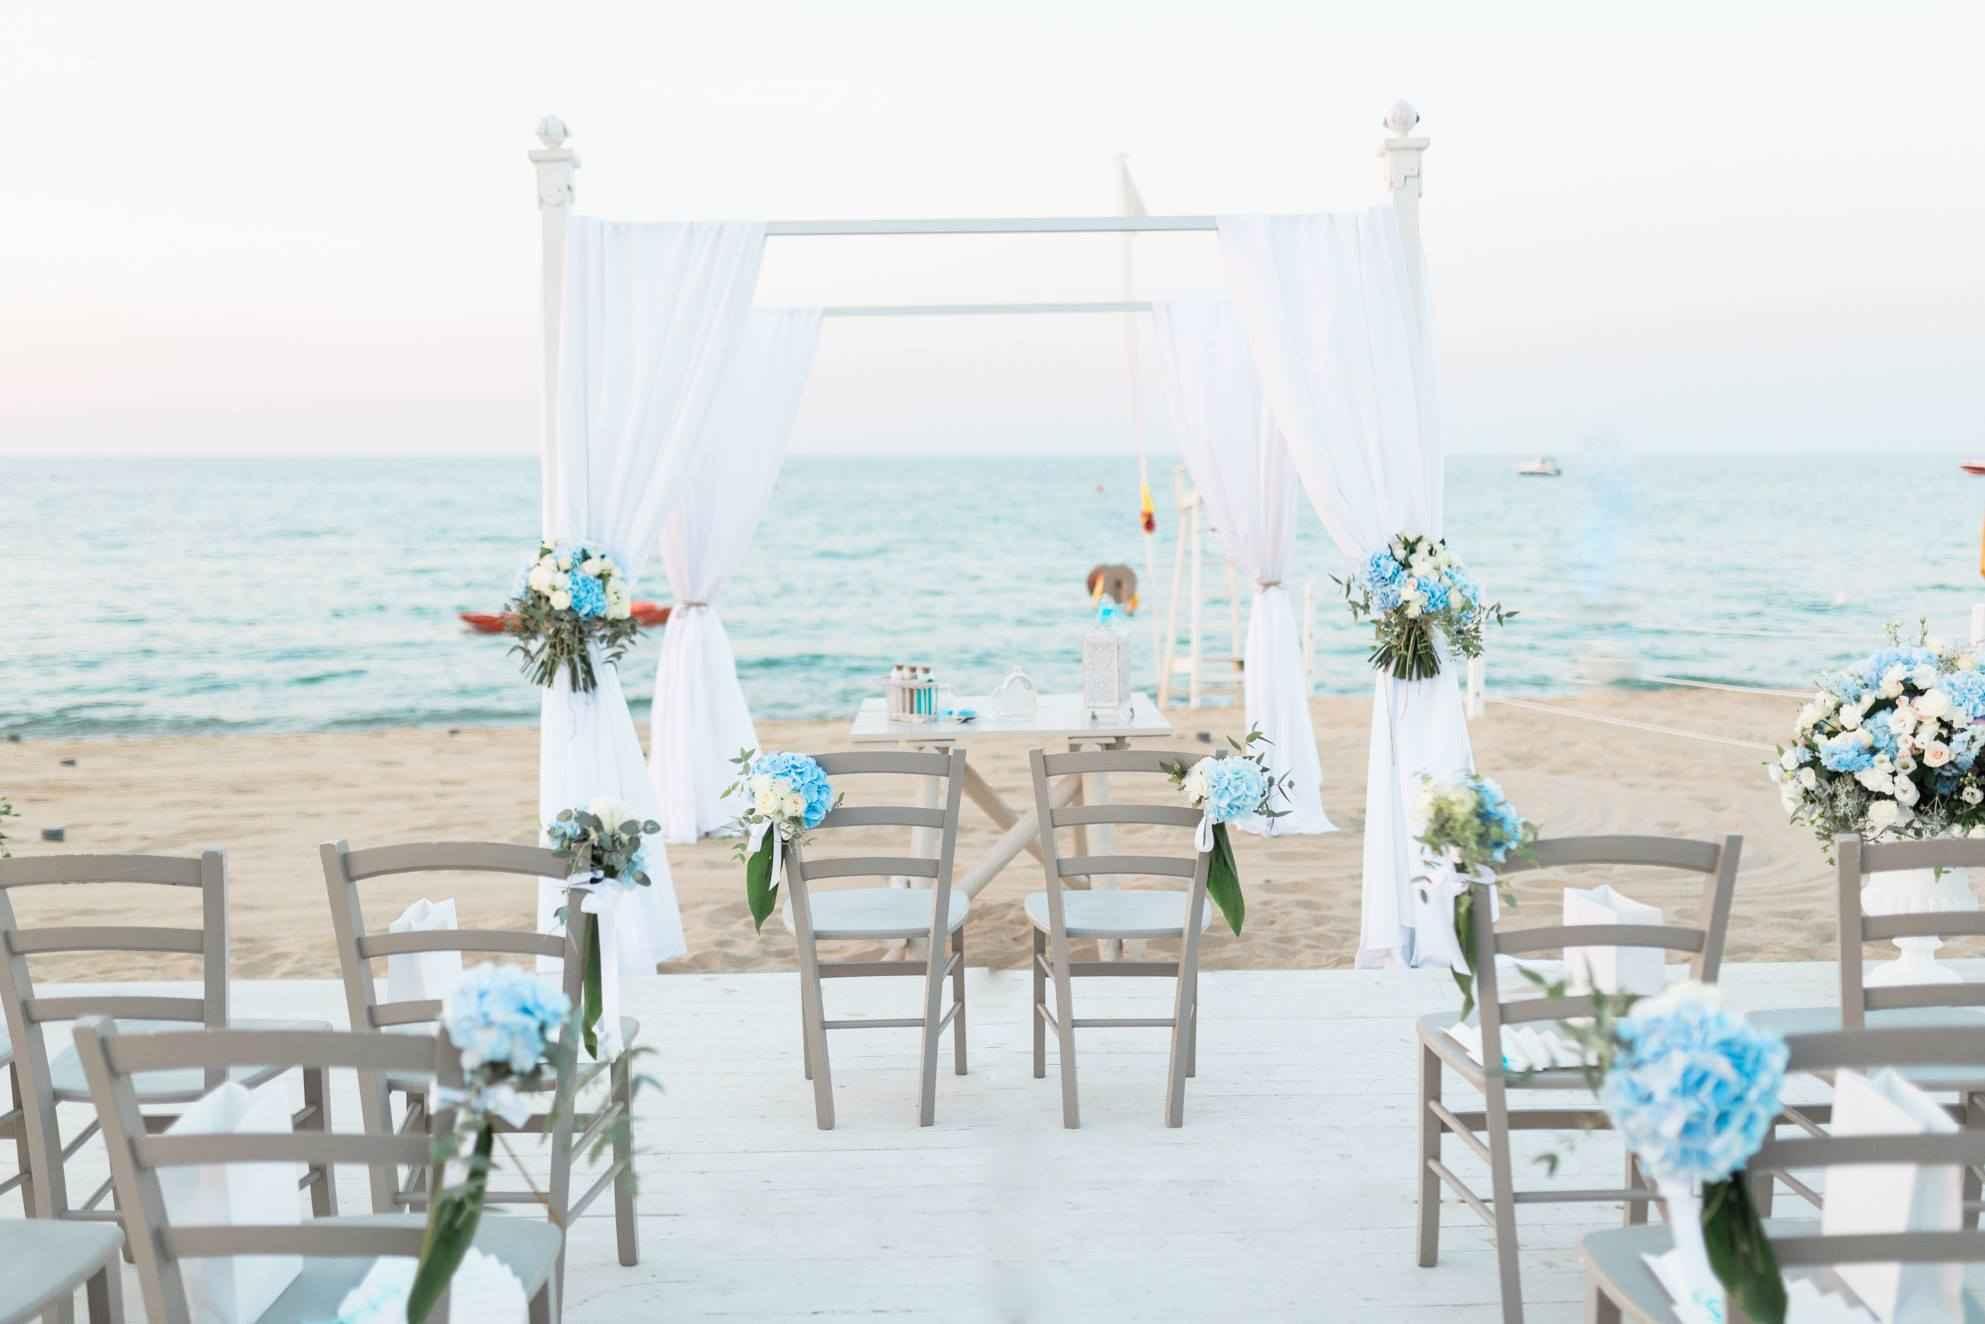 puglia beach wedding venues